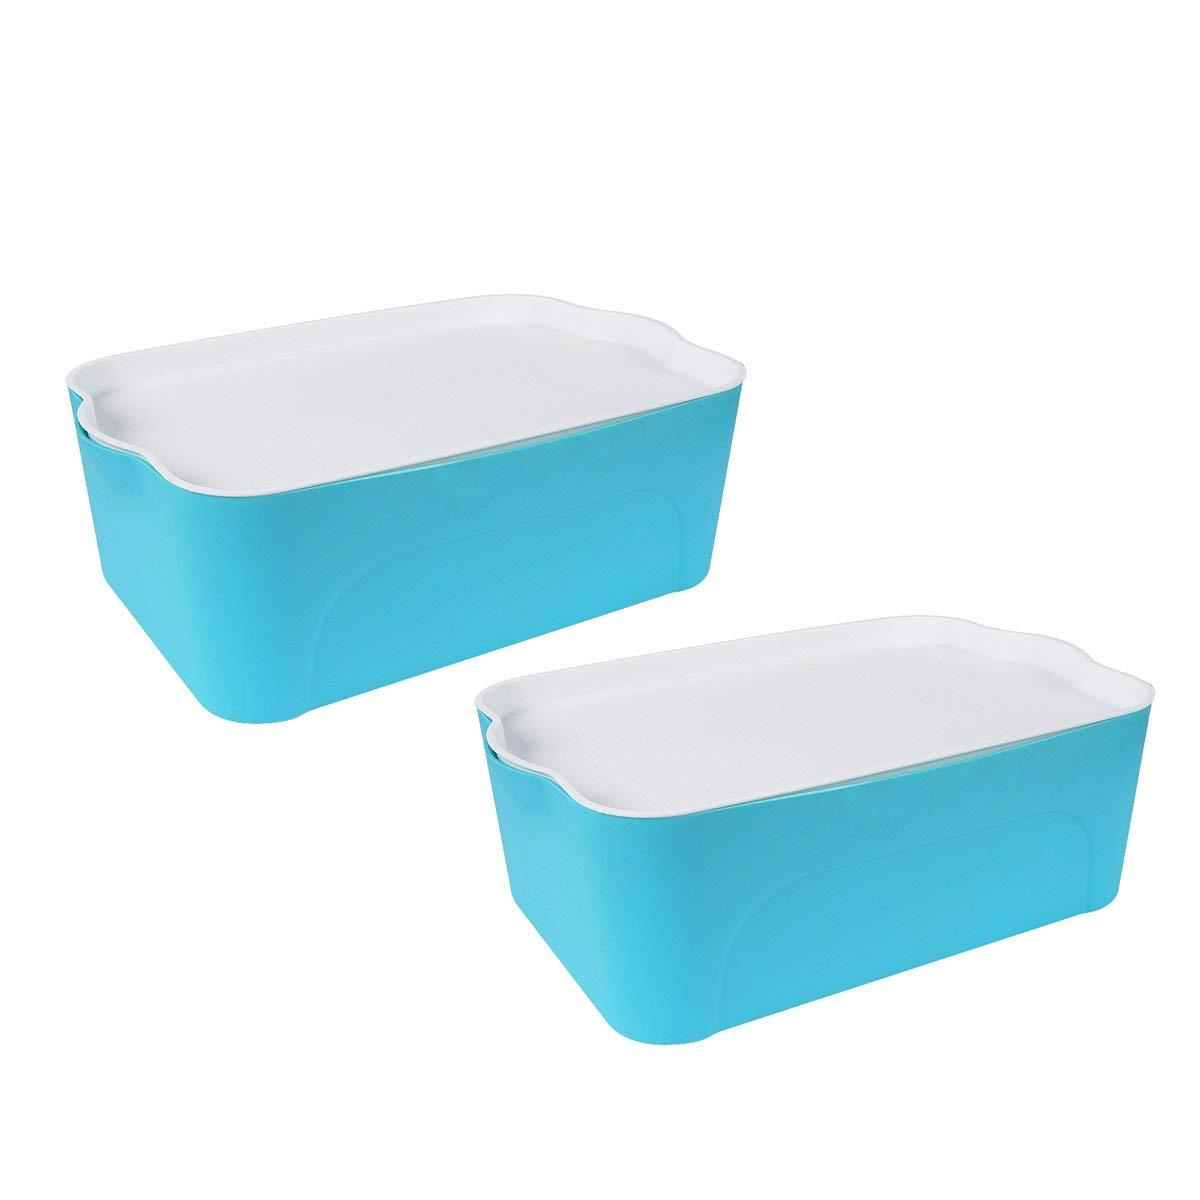 Saim Colorful Household Plastic Storage Container, Pack of 2, Medium, Blue